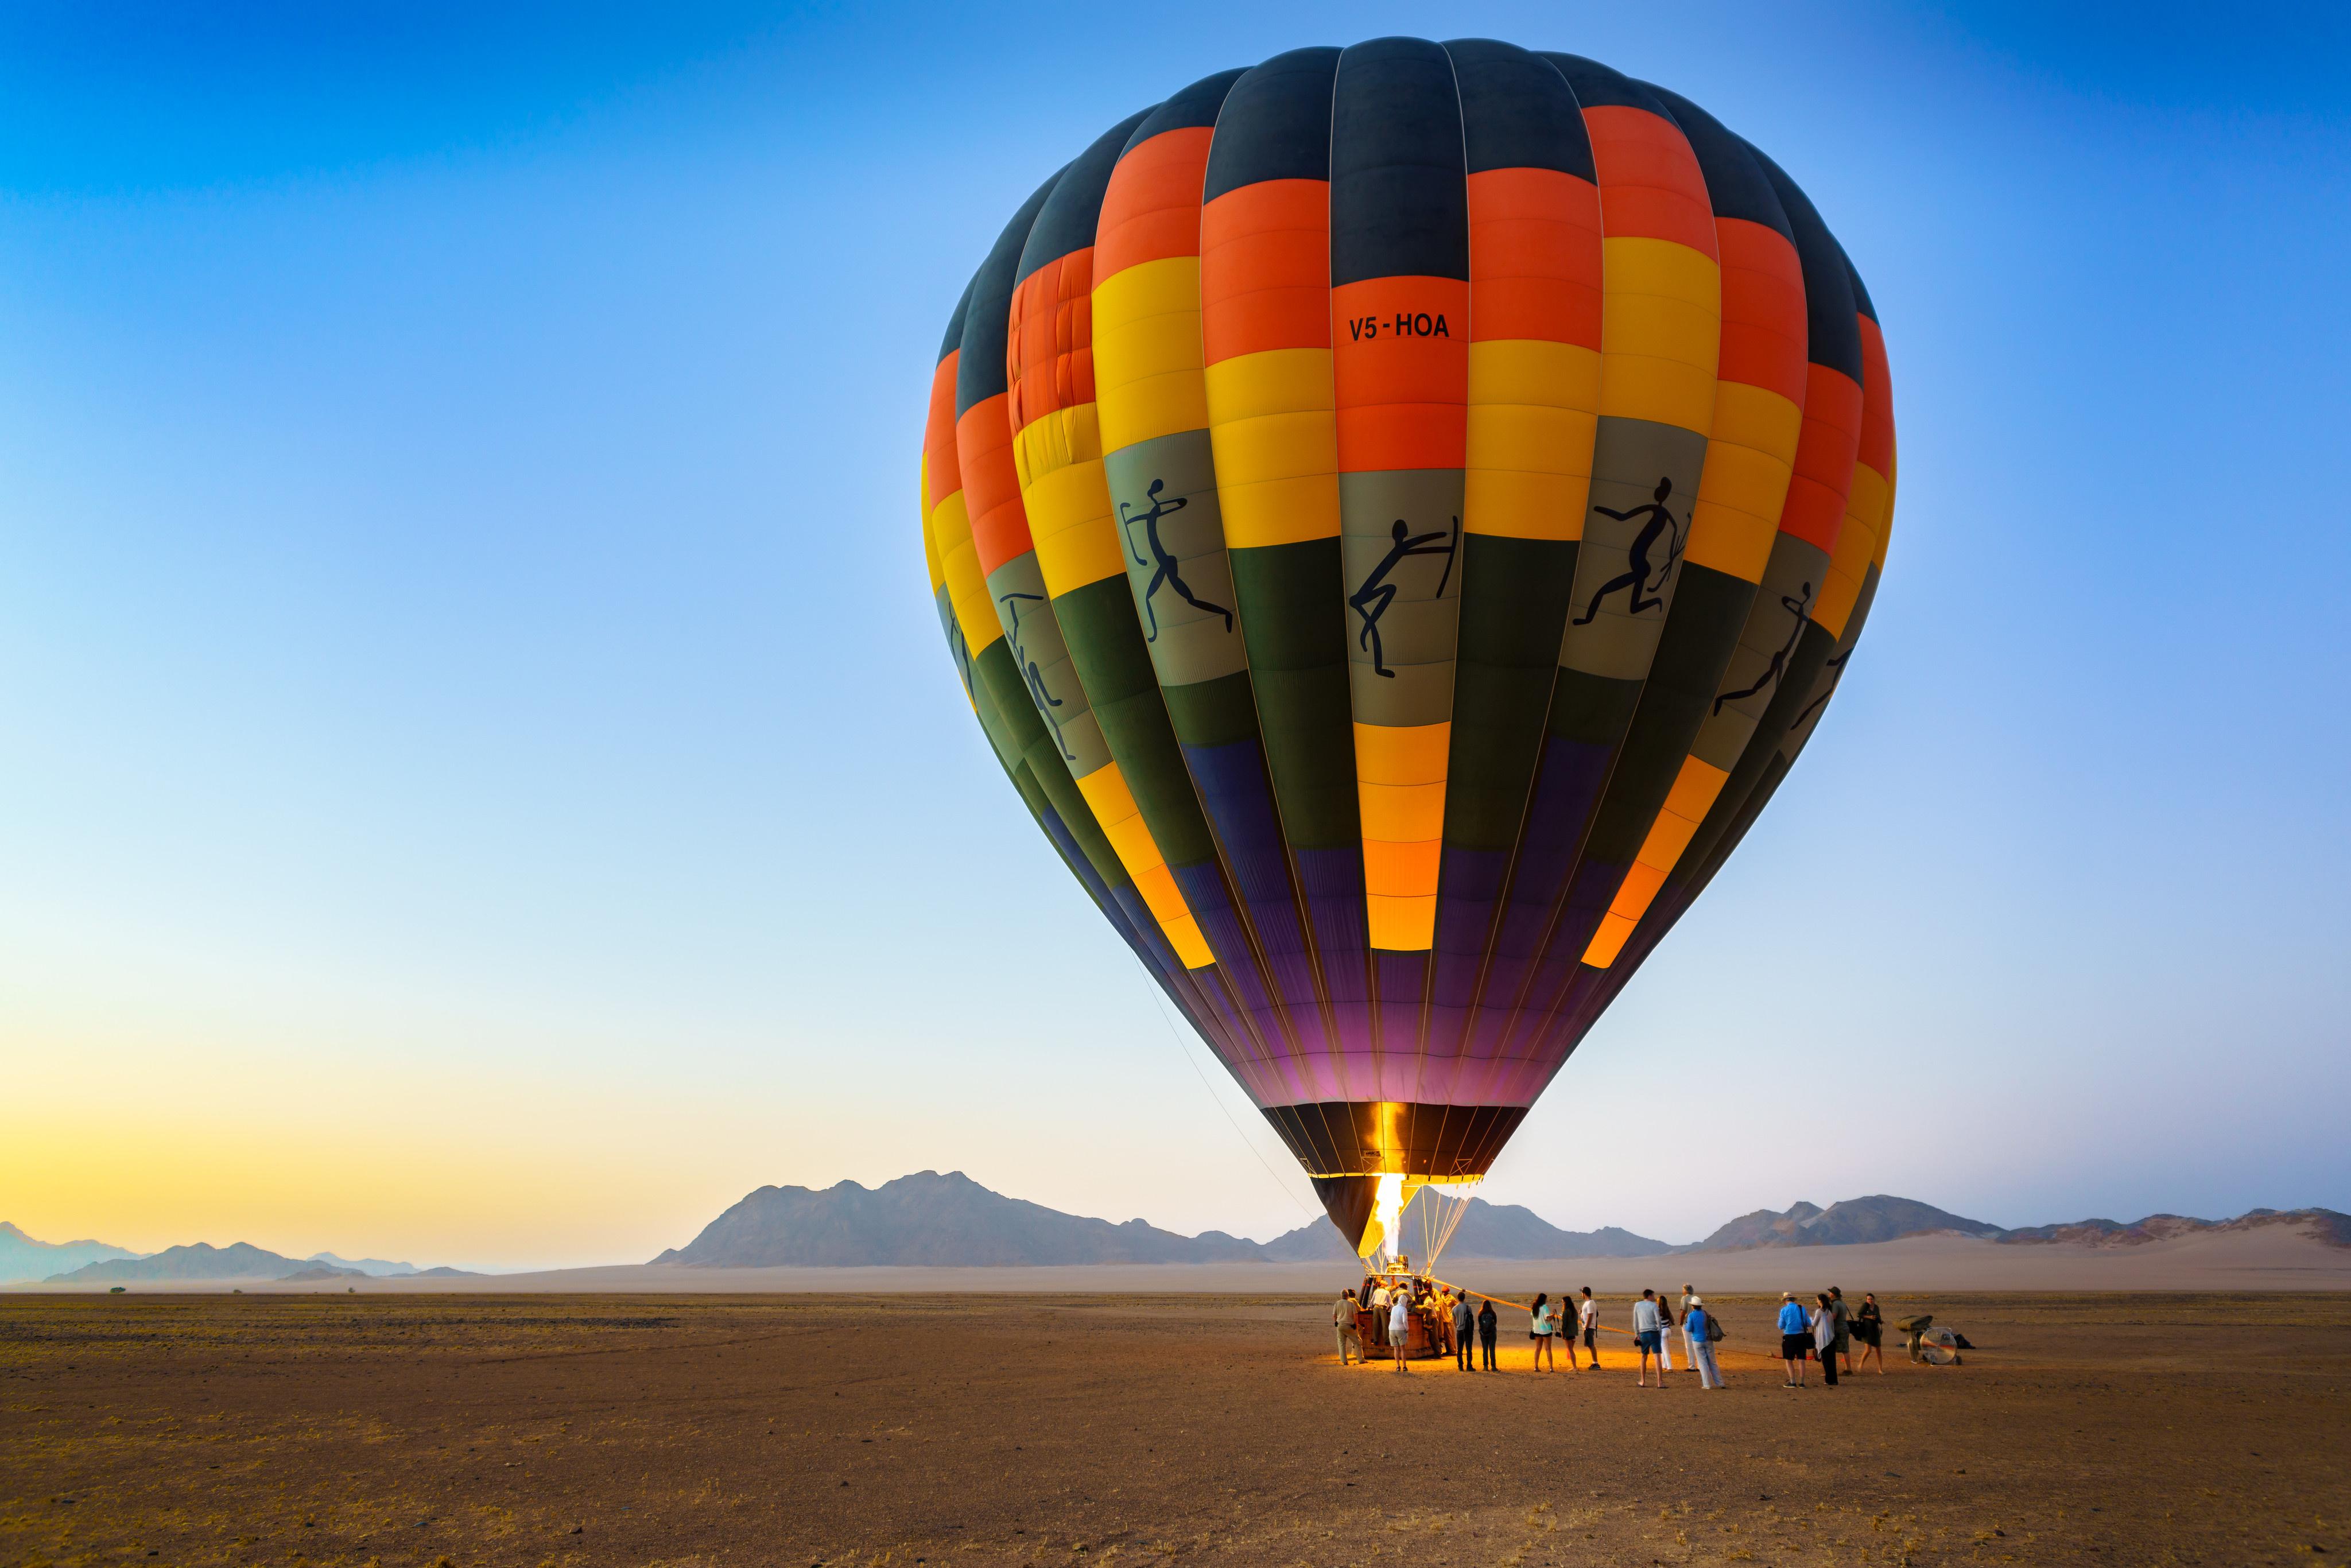 Картинки Африка аэростат Sossusvlei, Namib-Naukluft National Park, Namibia Природа Небо 4096x2732 Воздушный шар